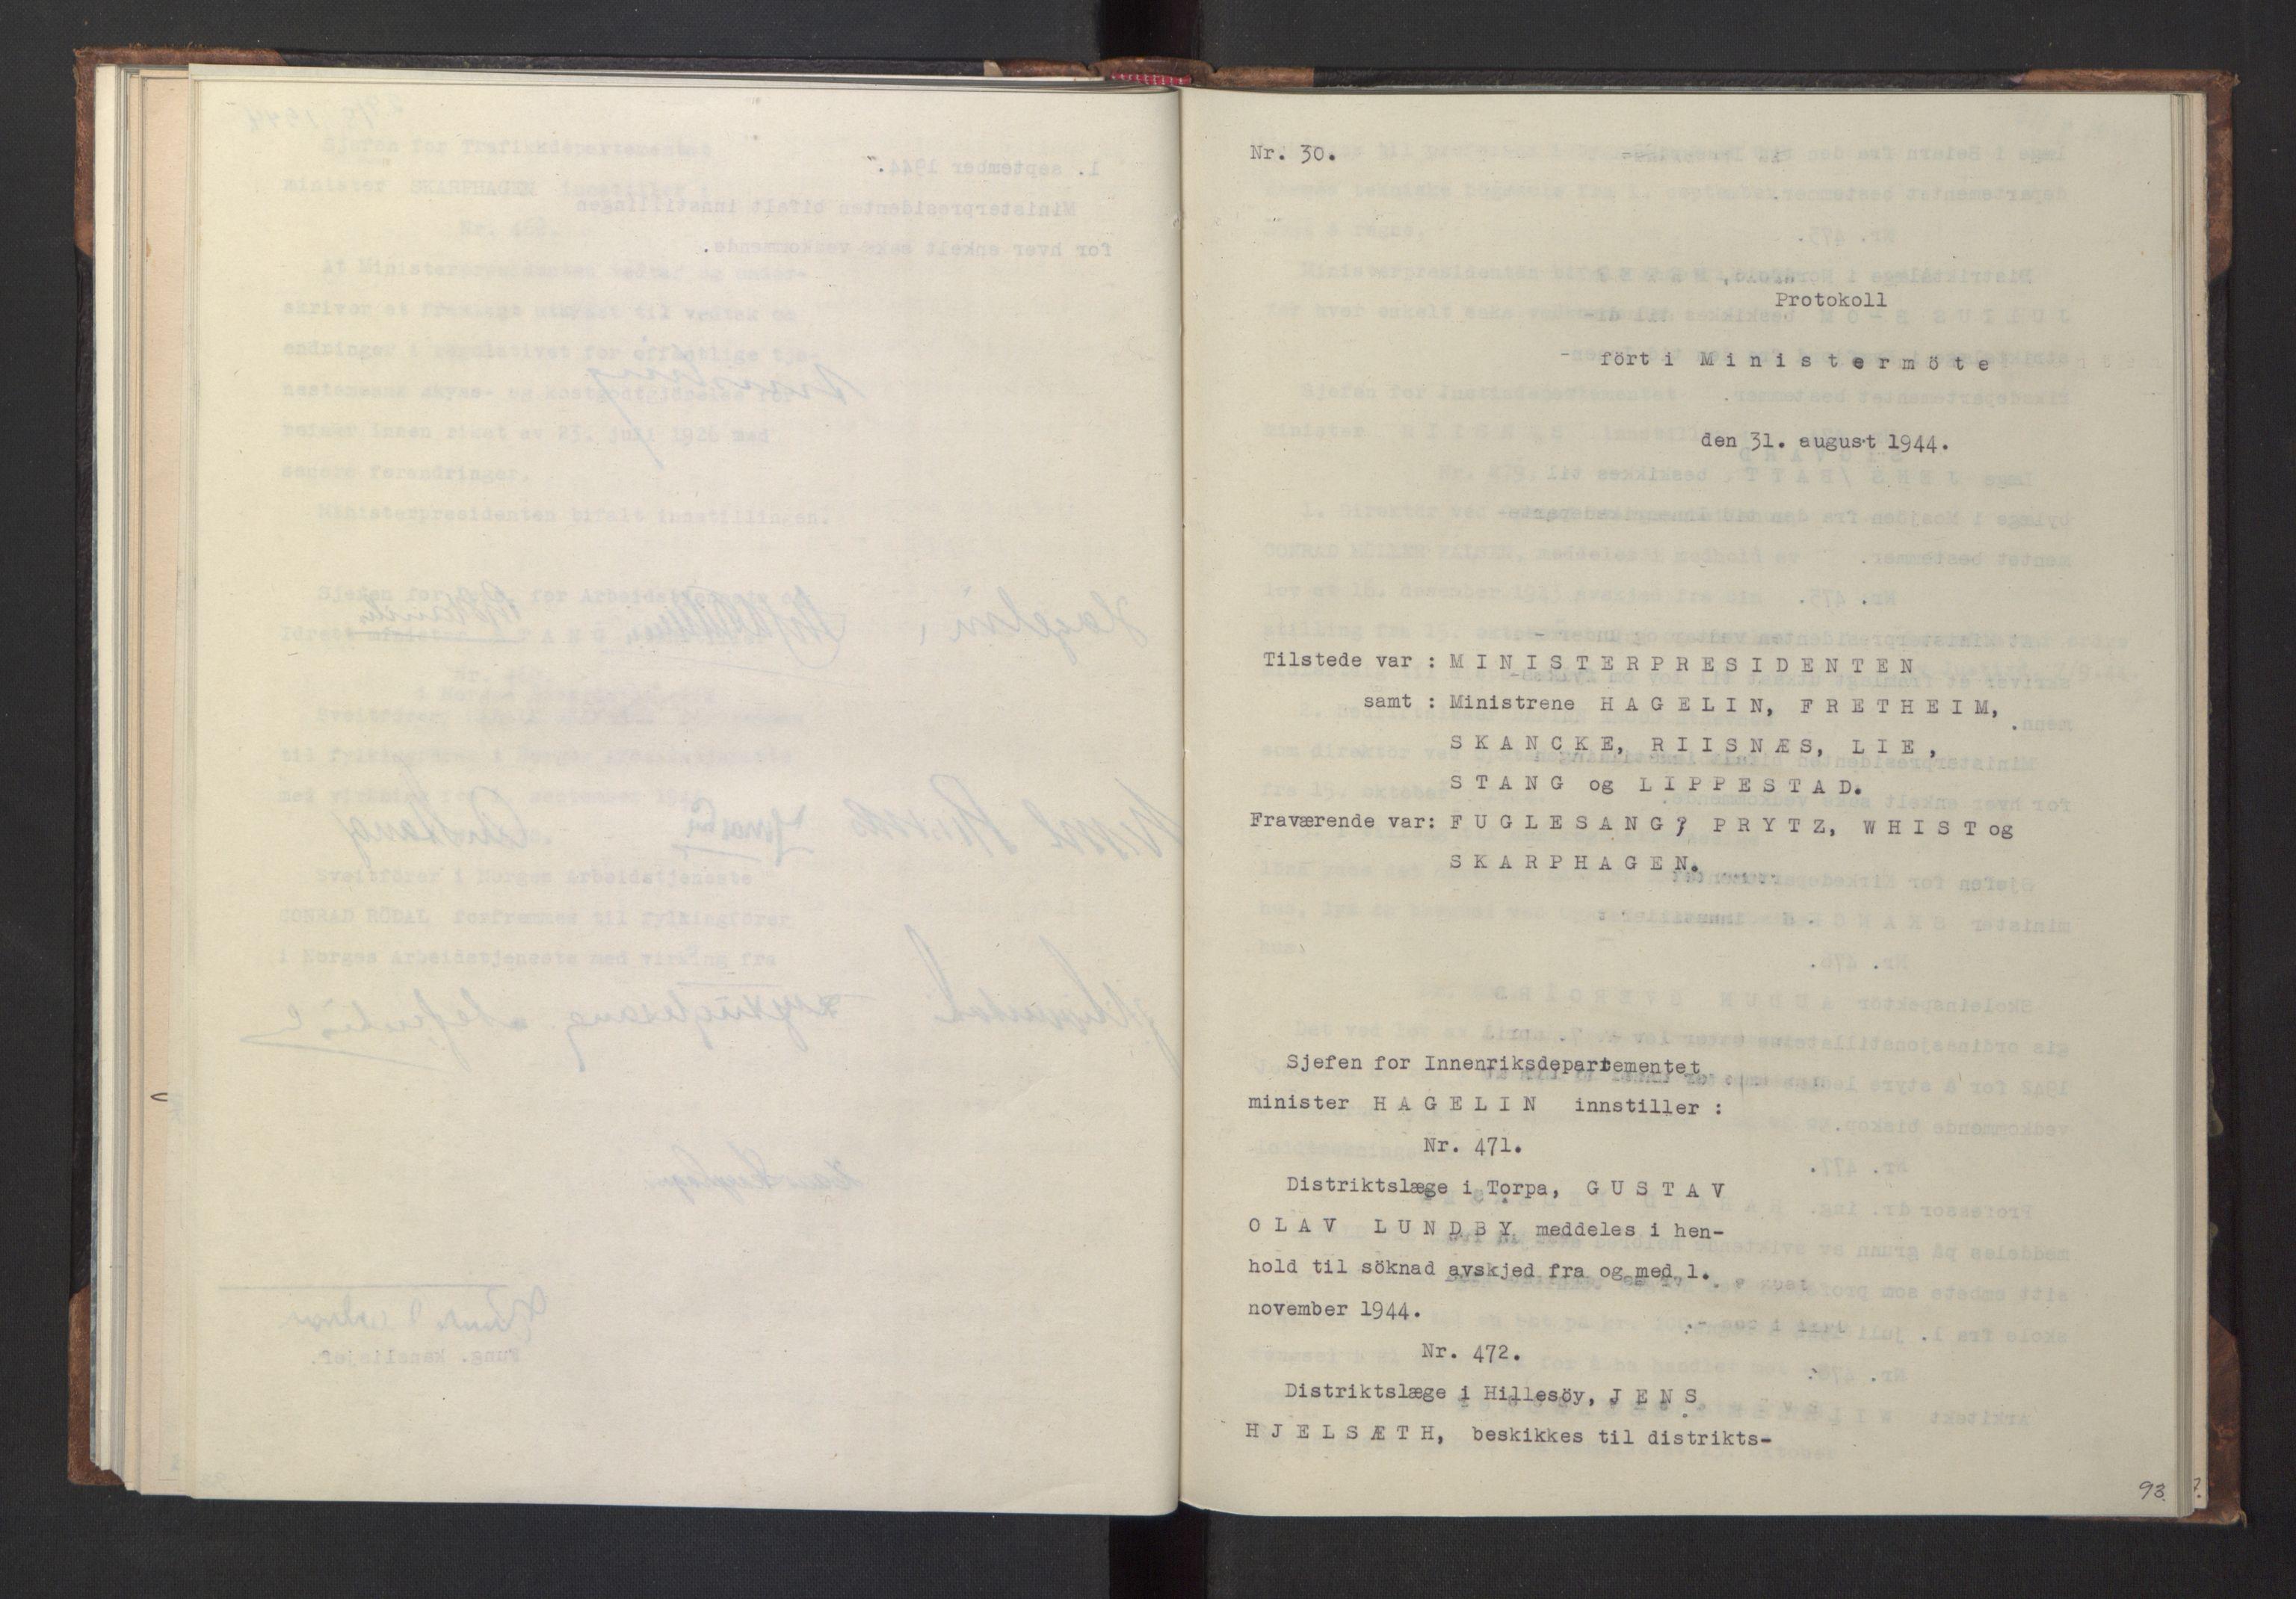 RA, NS-administrasjonen 1940-1945 (Statsrådsekretariatet, de kommisariske statsråder mm), D/Da/L0005: Protokoll fra ministermøter, 1944, s. 92b-93a